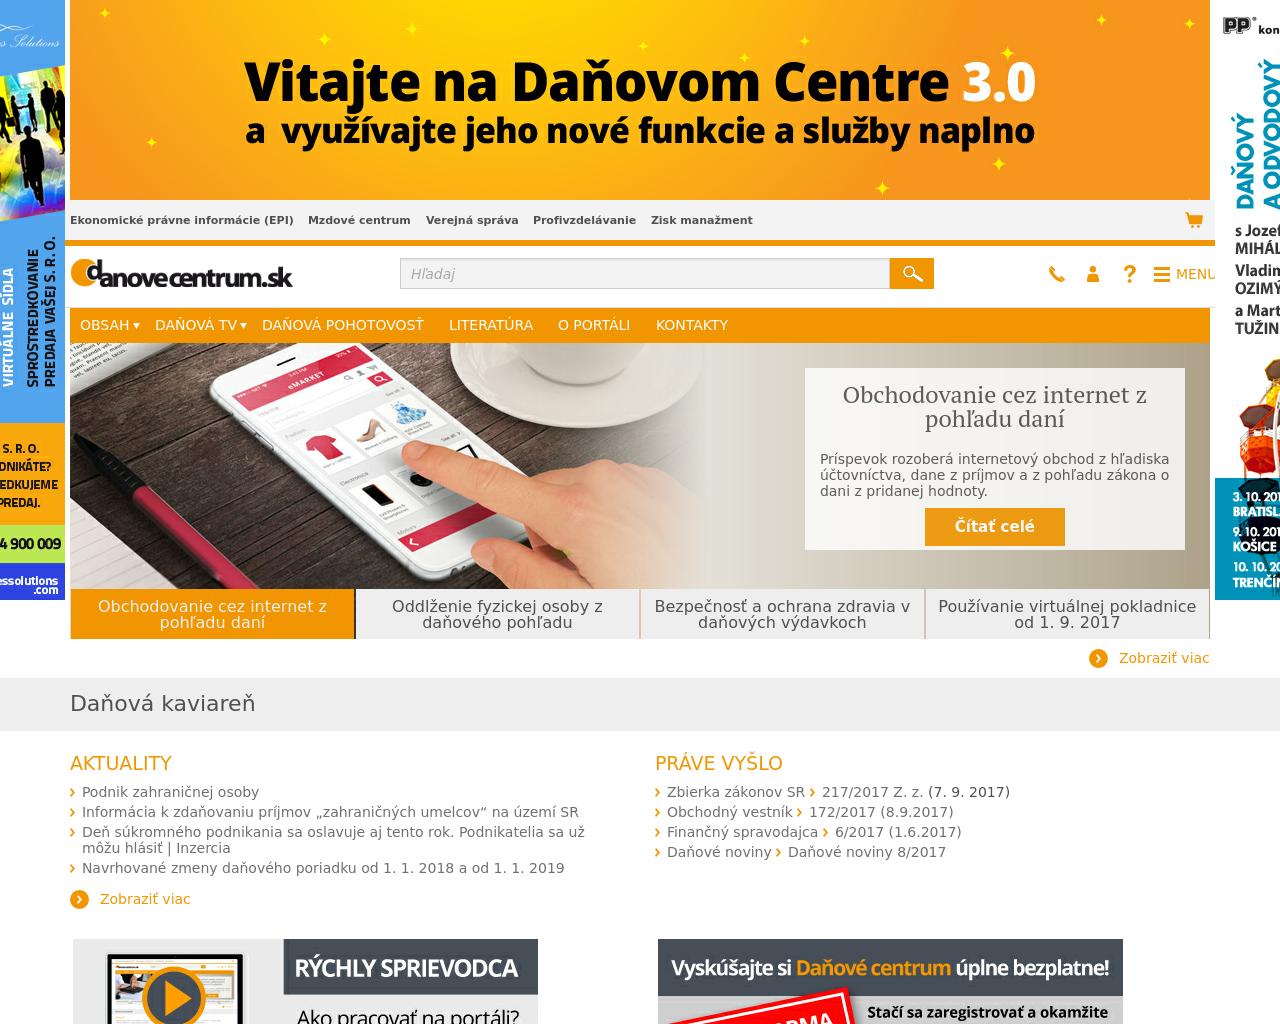 danovecentrum.sk-Advertising-Reviews-Pricing